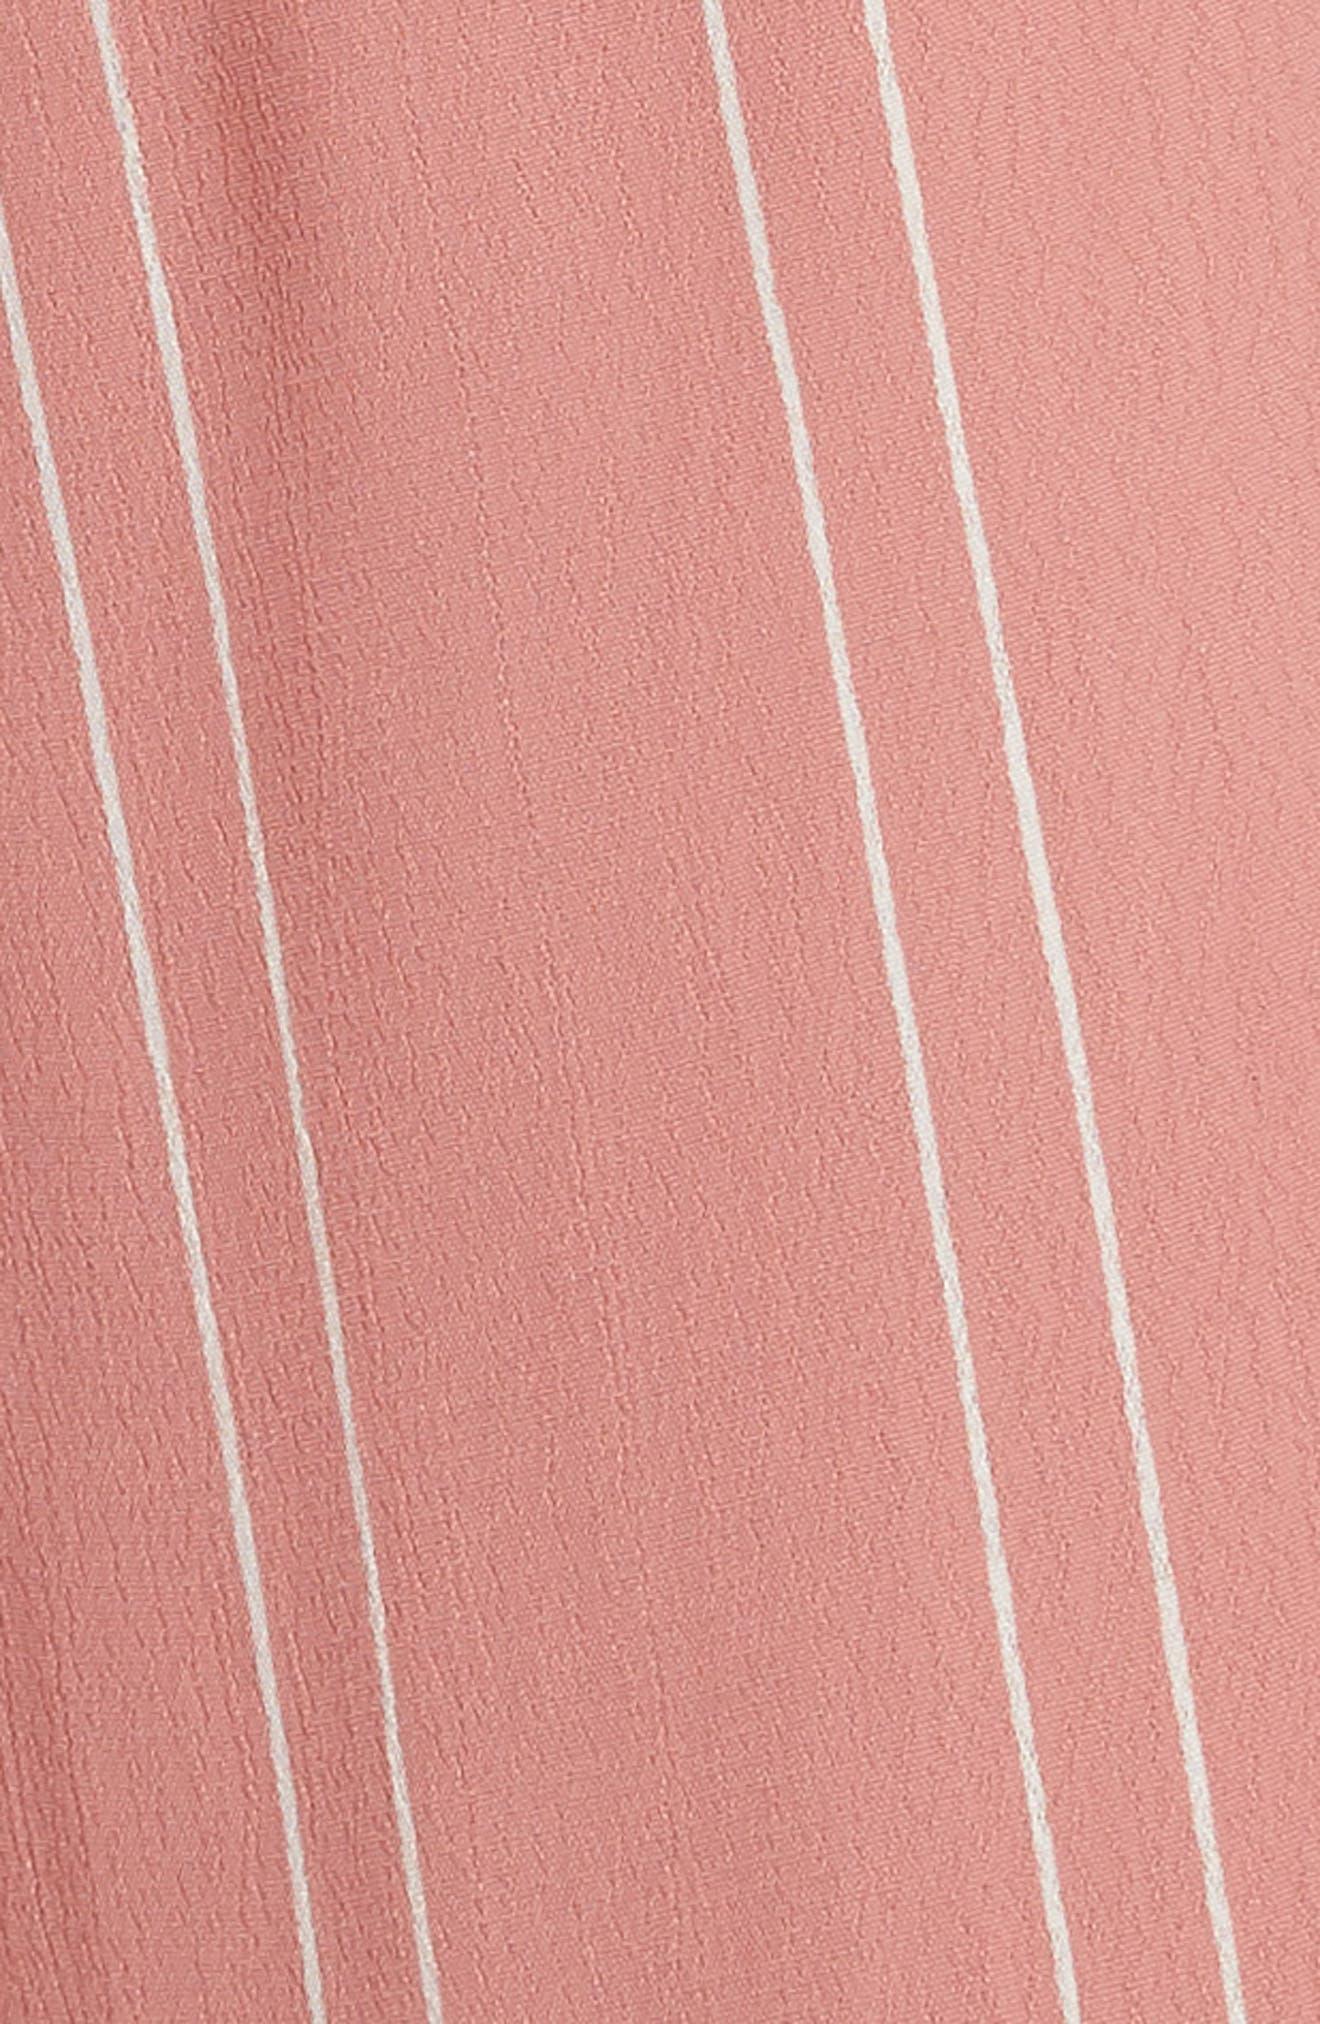 Keyhole Tie Jumpsuit,                             Alternate thumbnail 3, color,                             Coral Faded Stripe